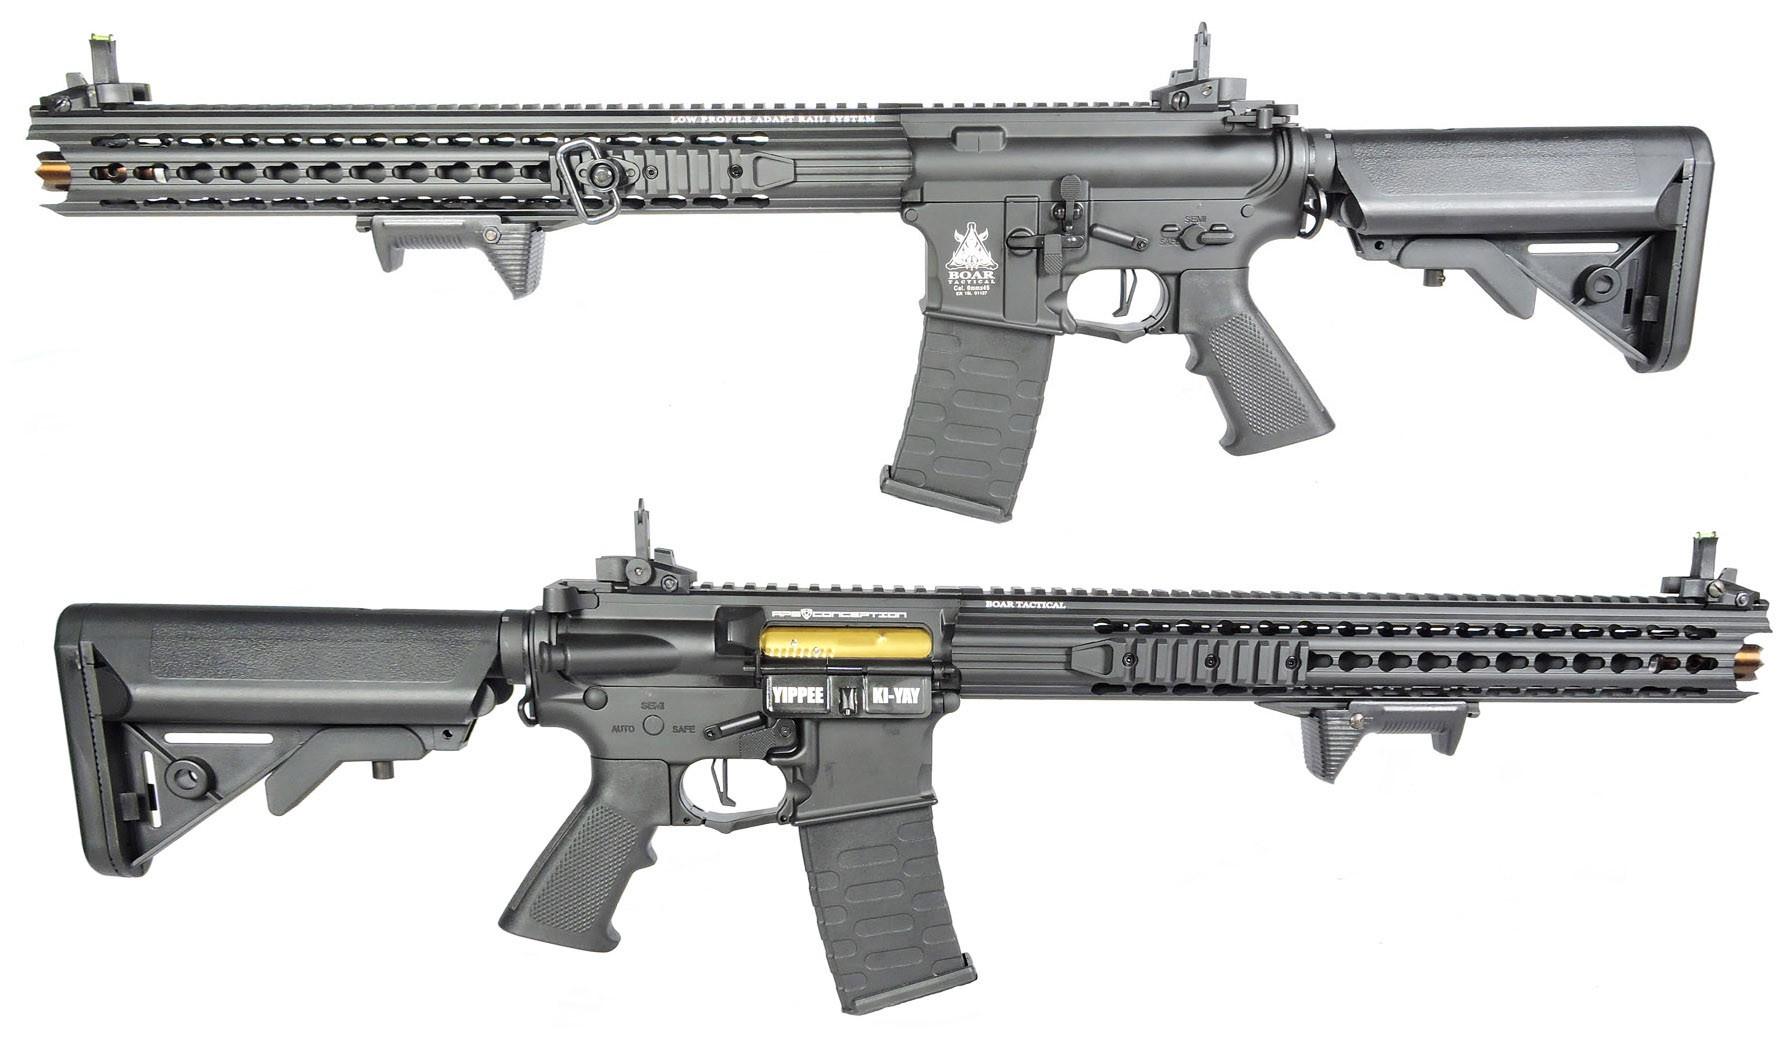 RIFLE DE AIRSOFT AEG M4 BOAR TACTICAL KEYMOD RIFLE FULL METAL BLOWBACK ASR117 - APS